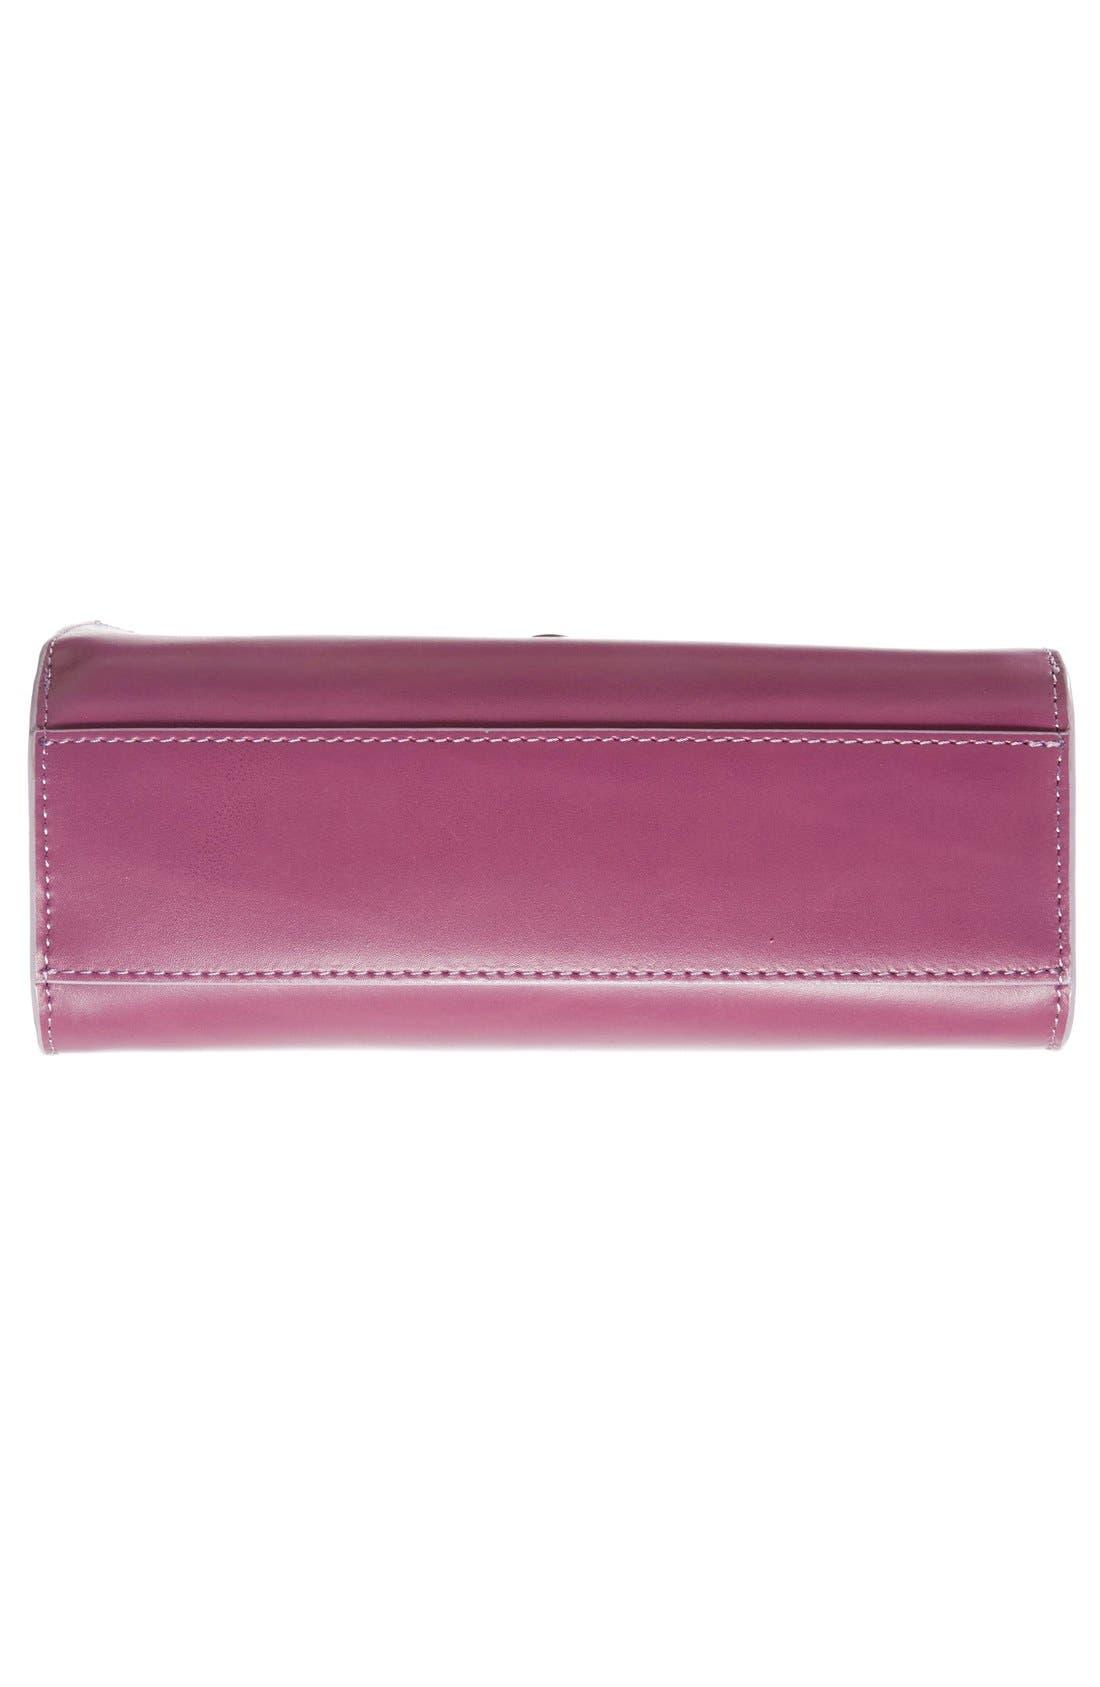 Lodis'Audrey Collection -Vicky' ConvertibleCrossbody Bag,                             Main thumbnail 8, color,